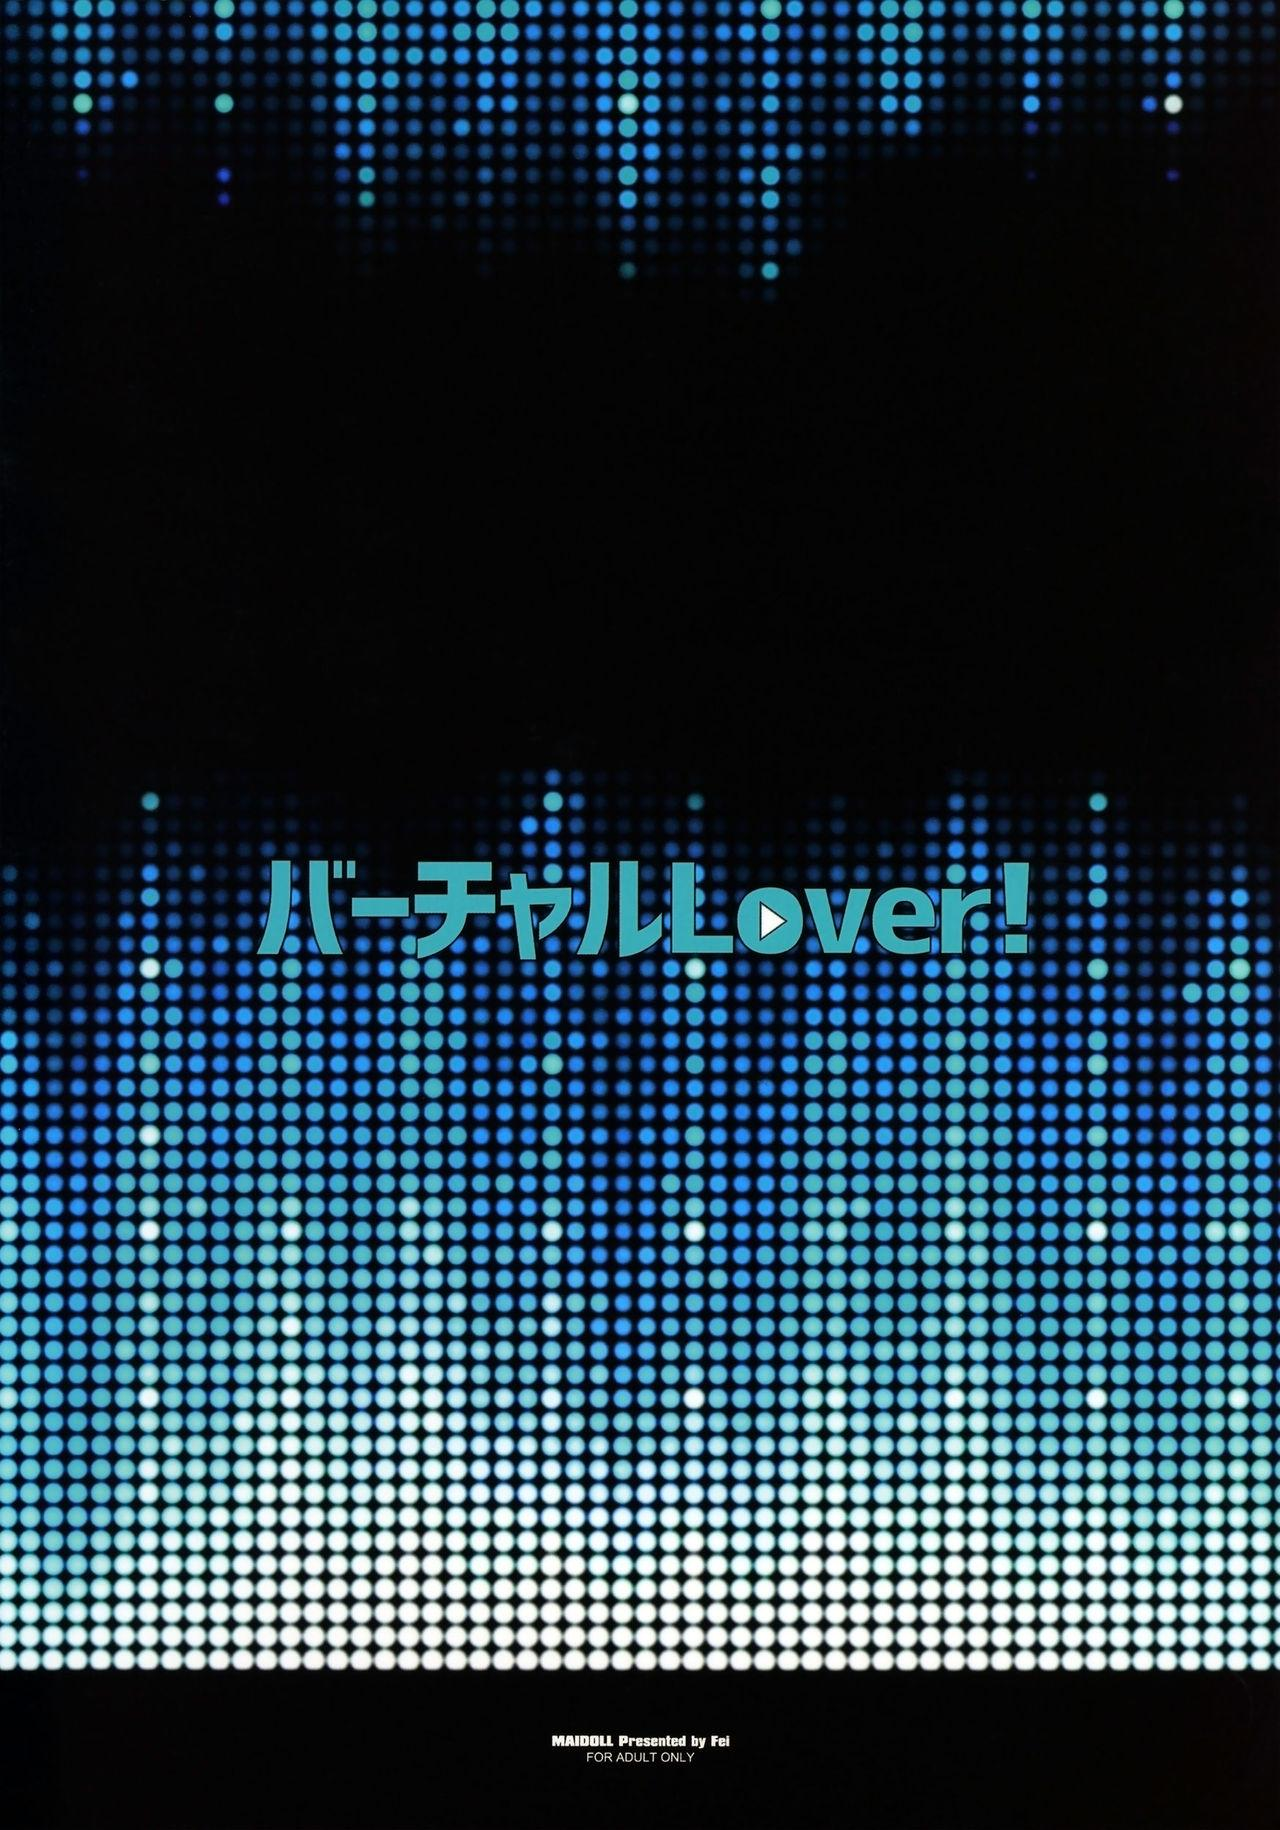 Virtual Lover! + Omake Poster 24